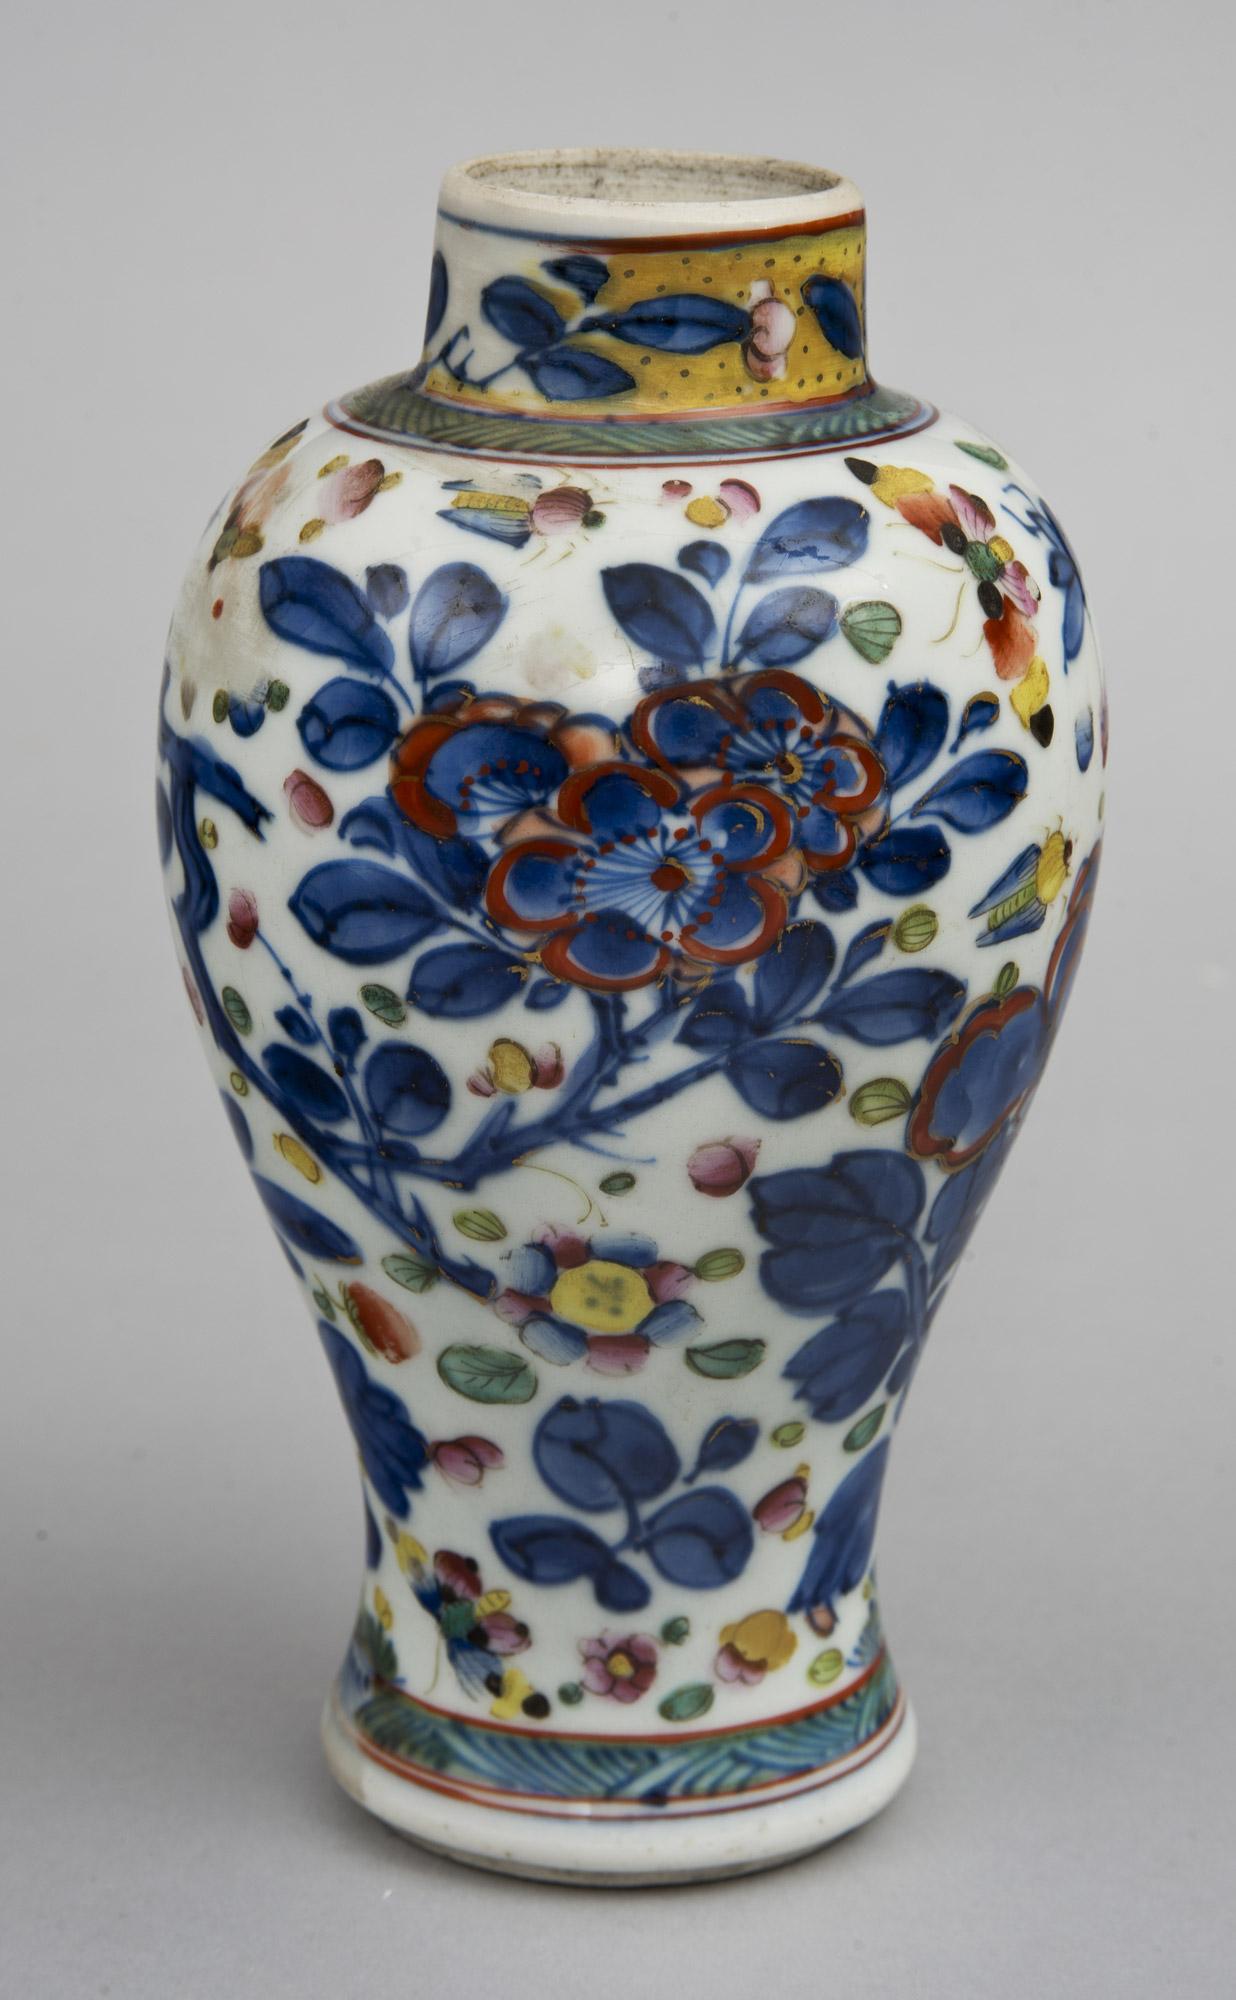 Chinese Qianlong Clobbered Vase Circa 1700